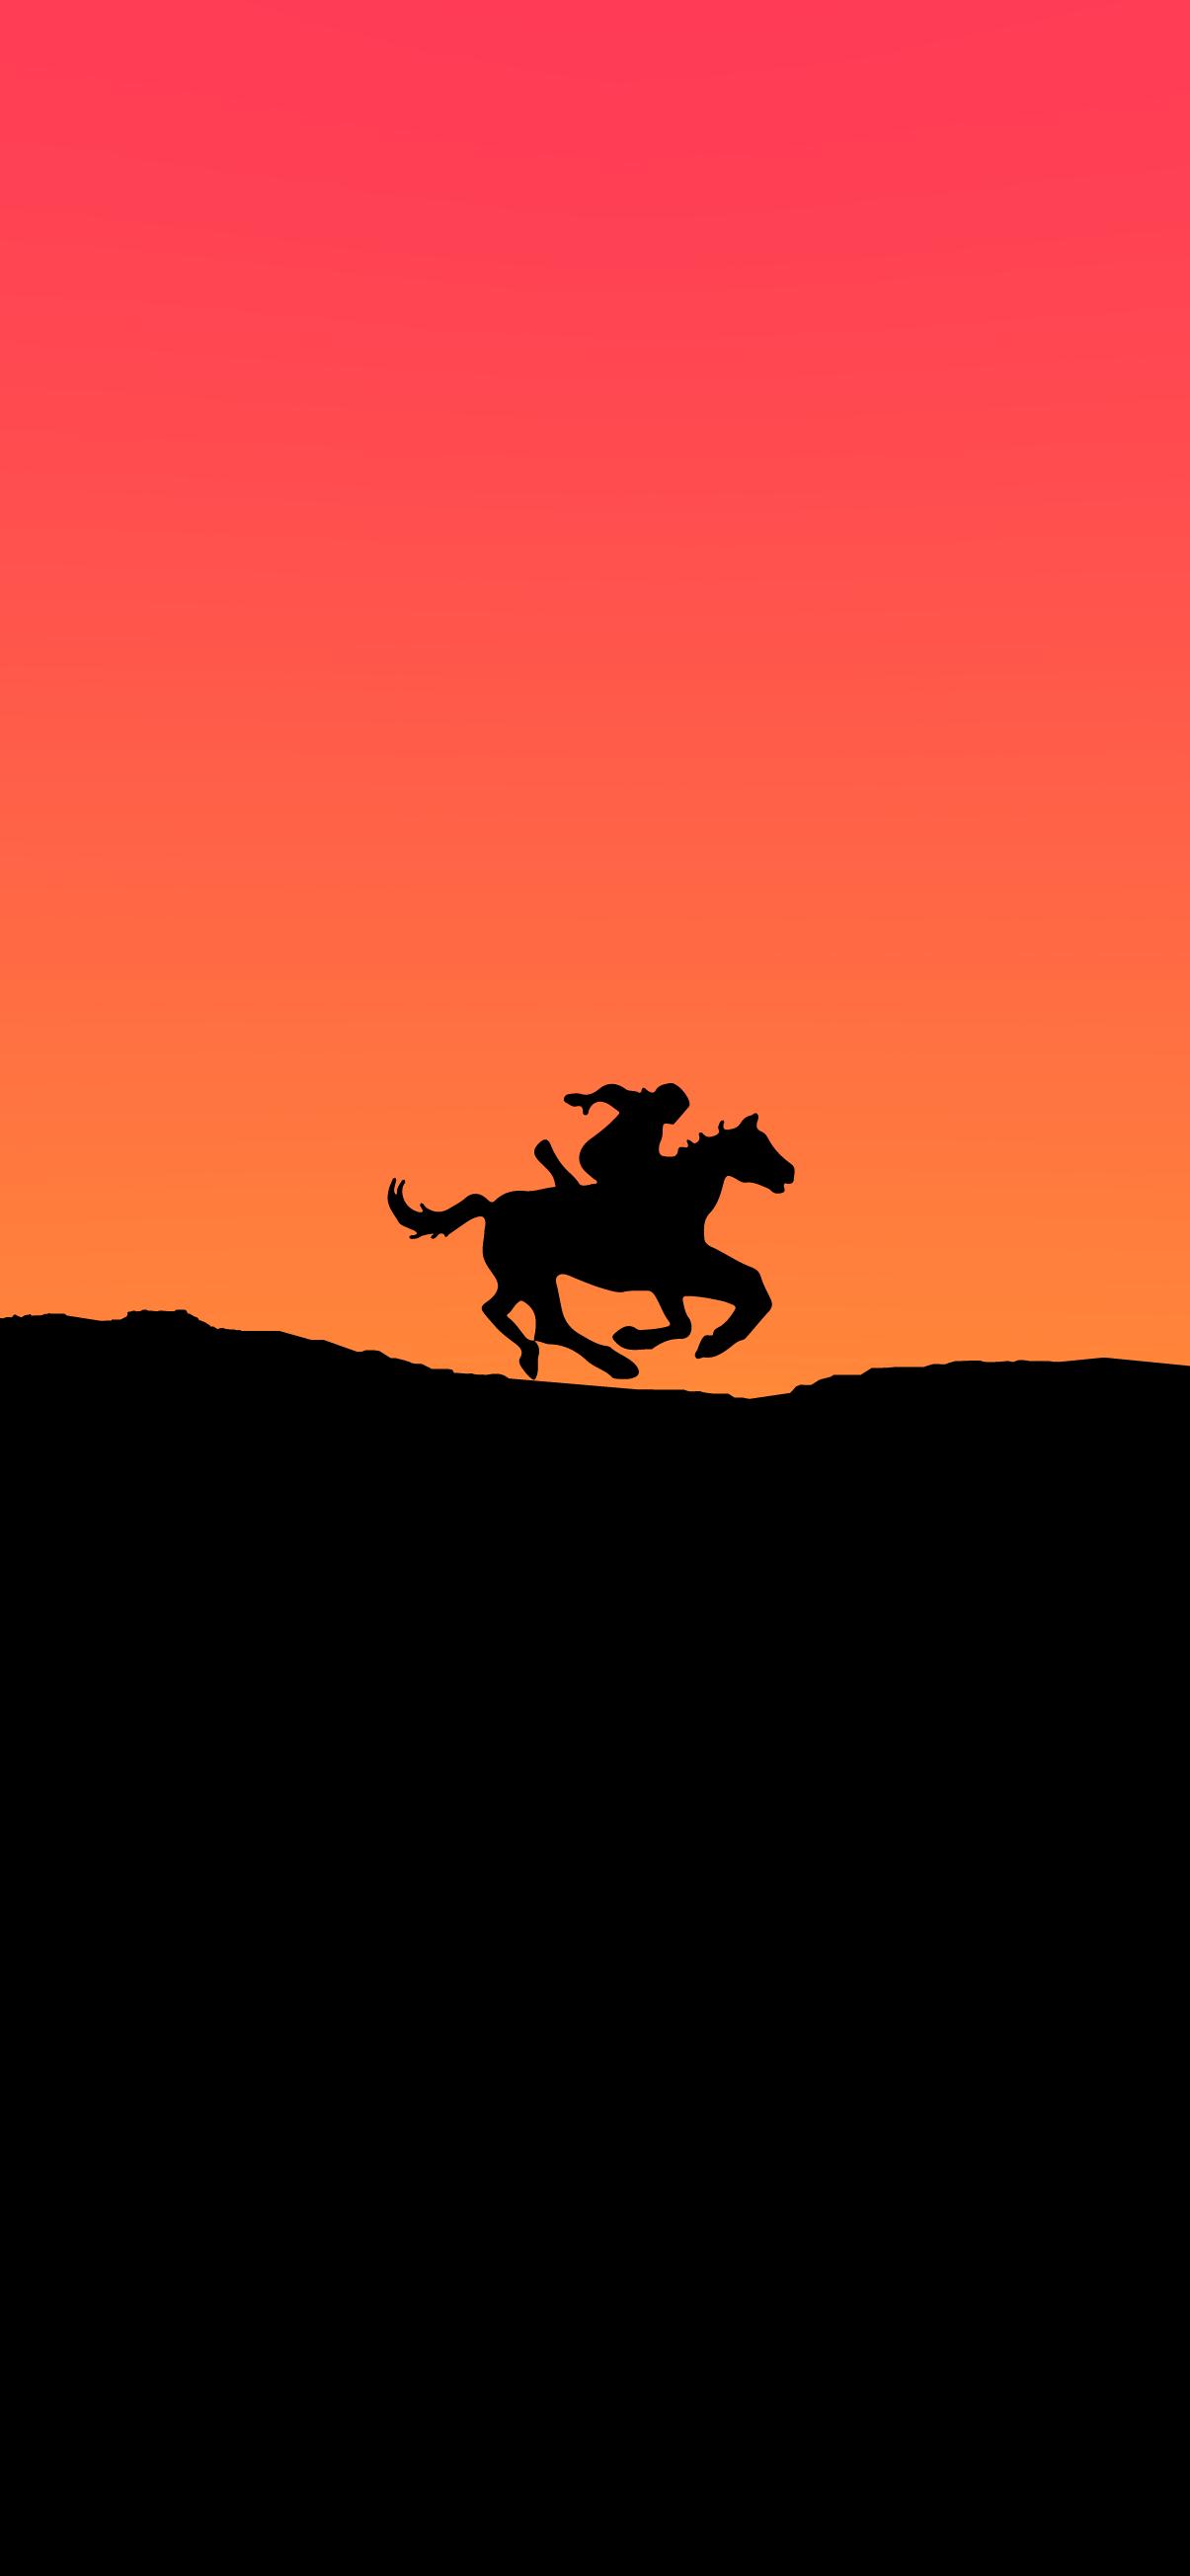 horse running warrior silhouette minimalist background wallpaper 4k for iphone